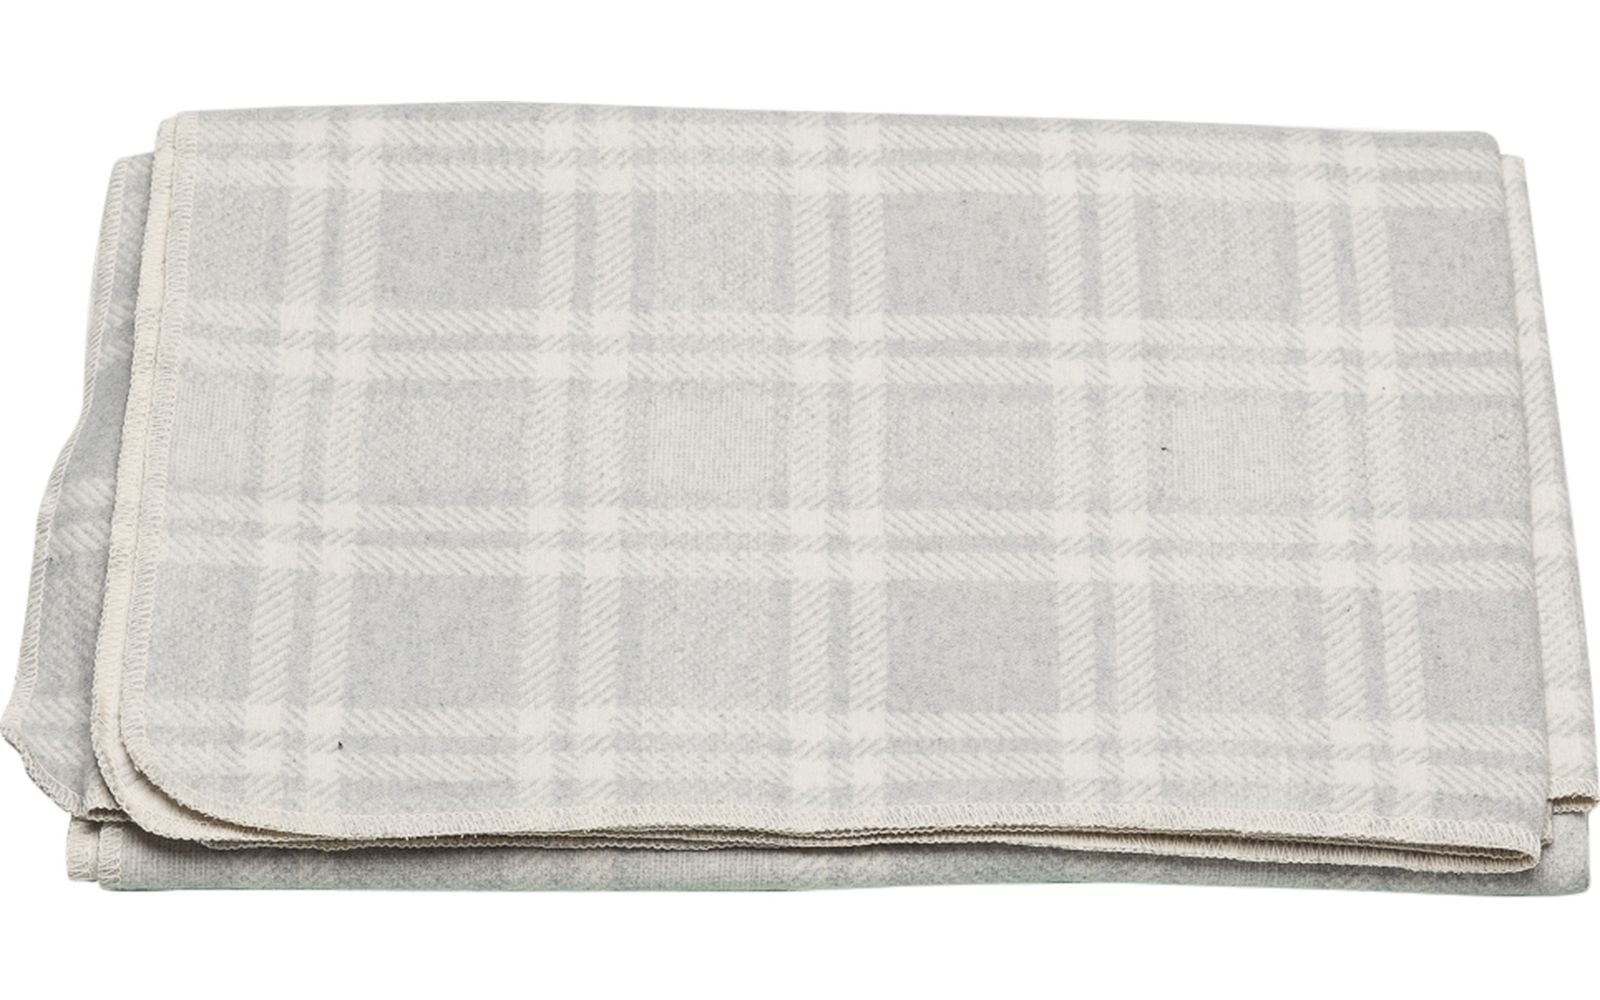 Blanket - Checkered - Light Grey-1